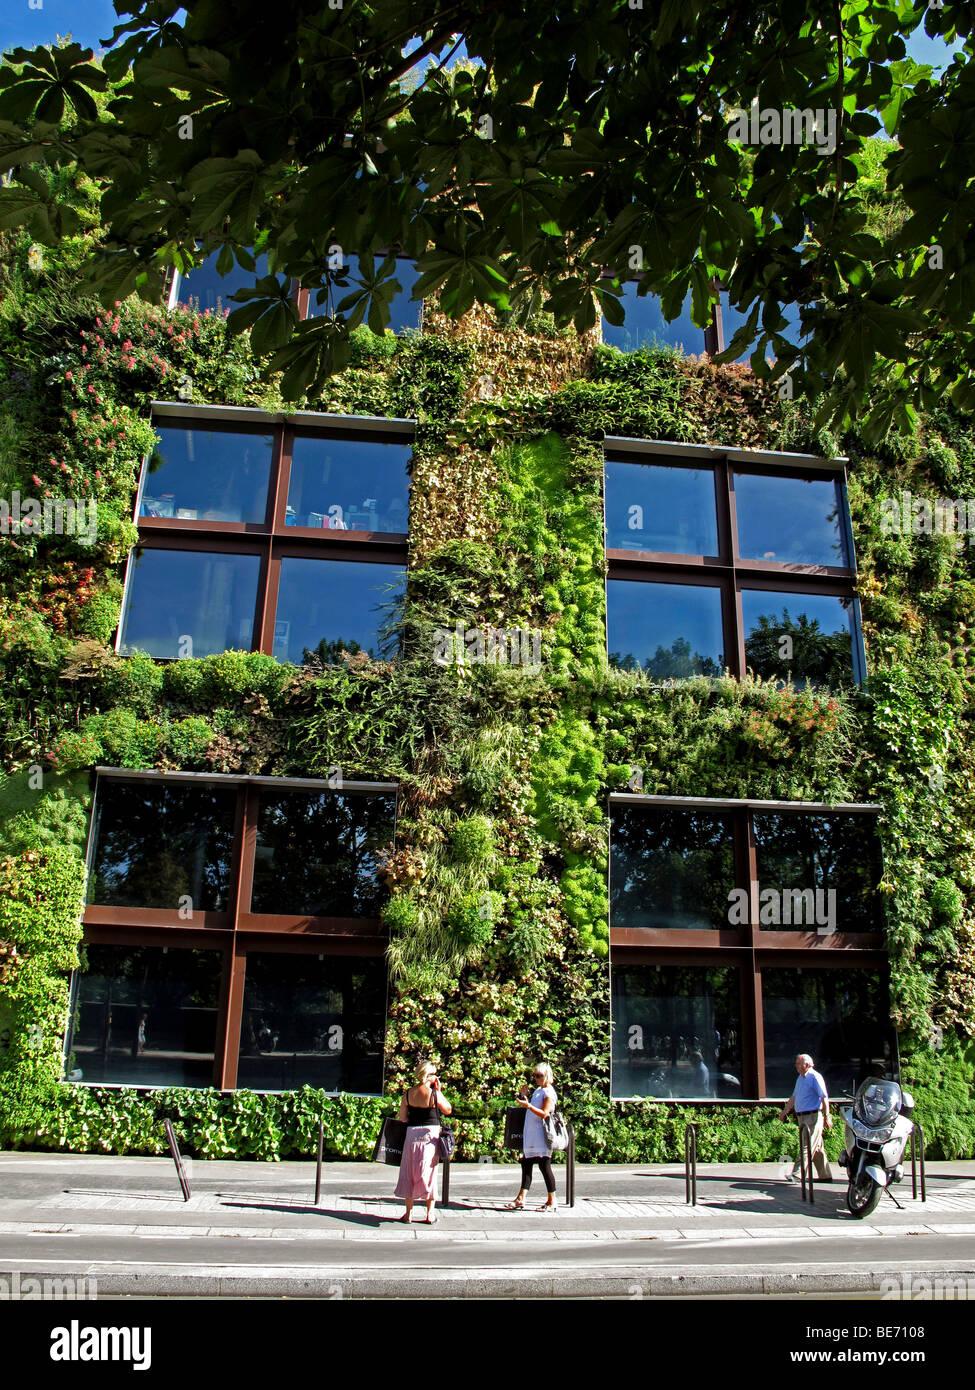 Musee Du Quai Branly Green Wall Stockfotos & Musee Du Quai Branly ...